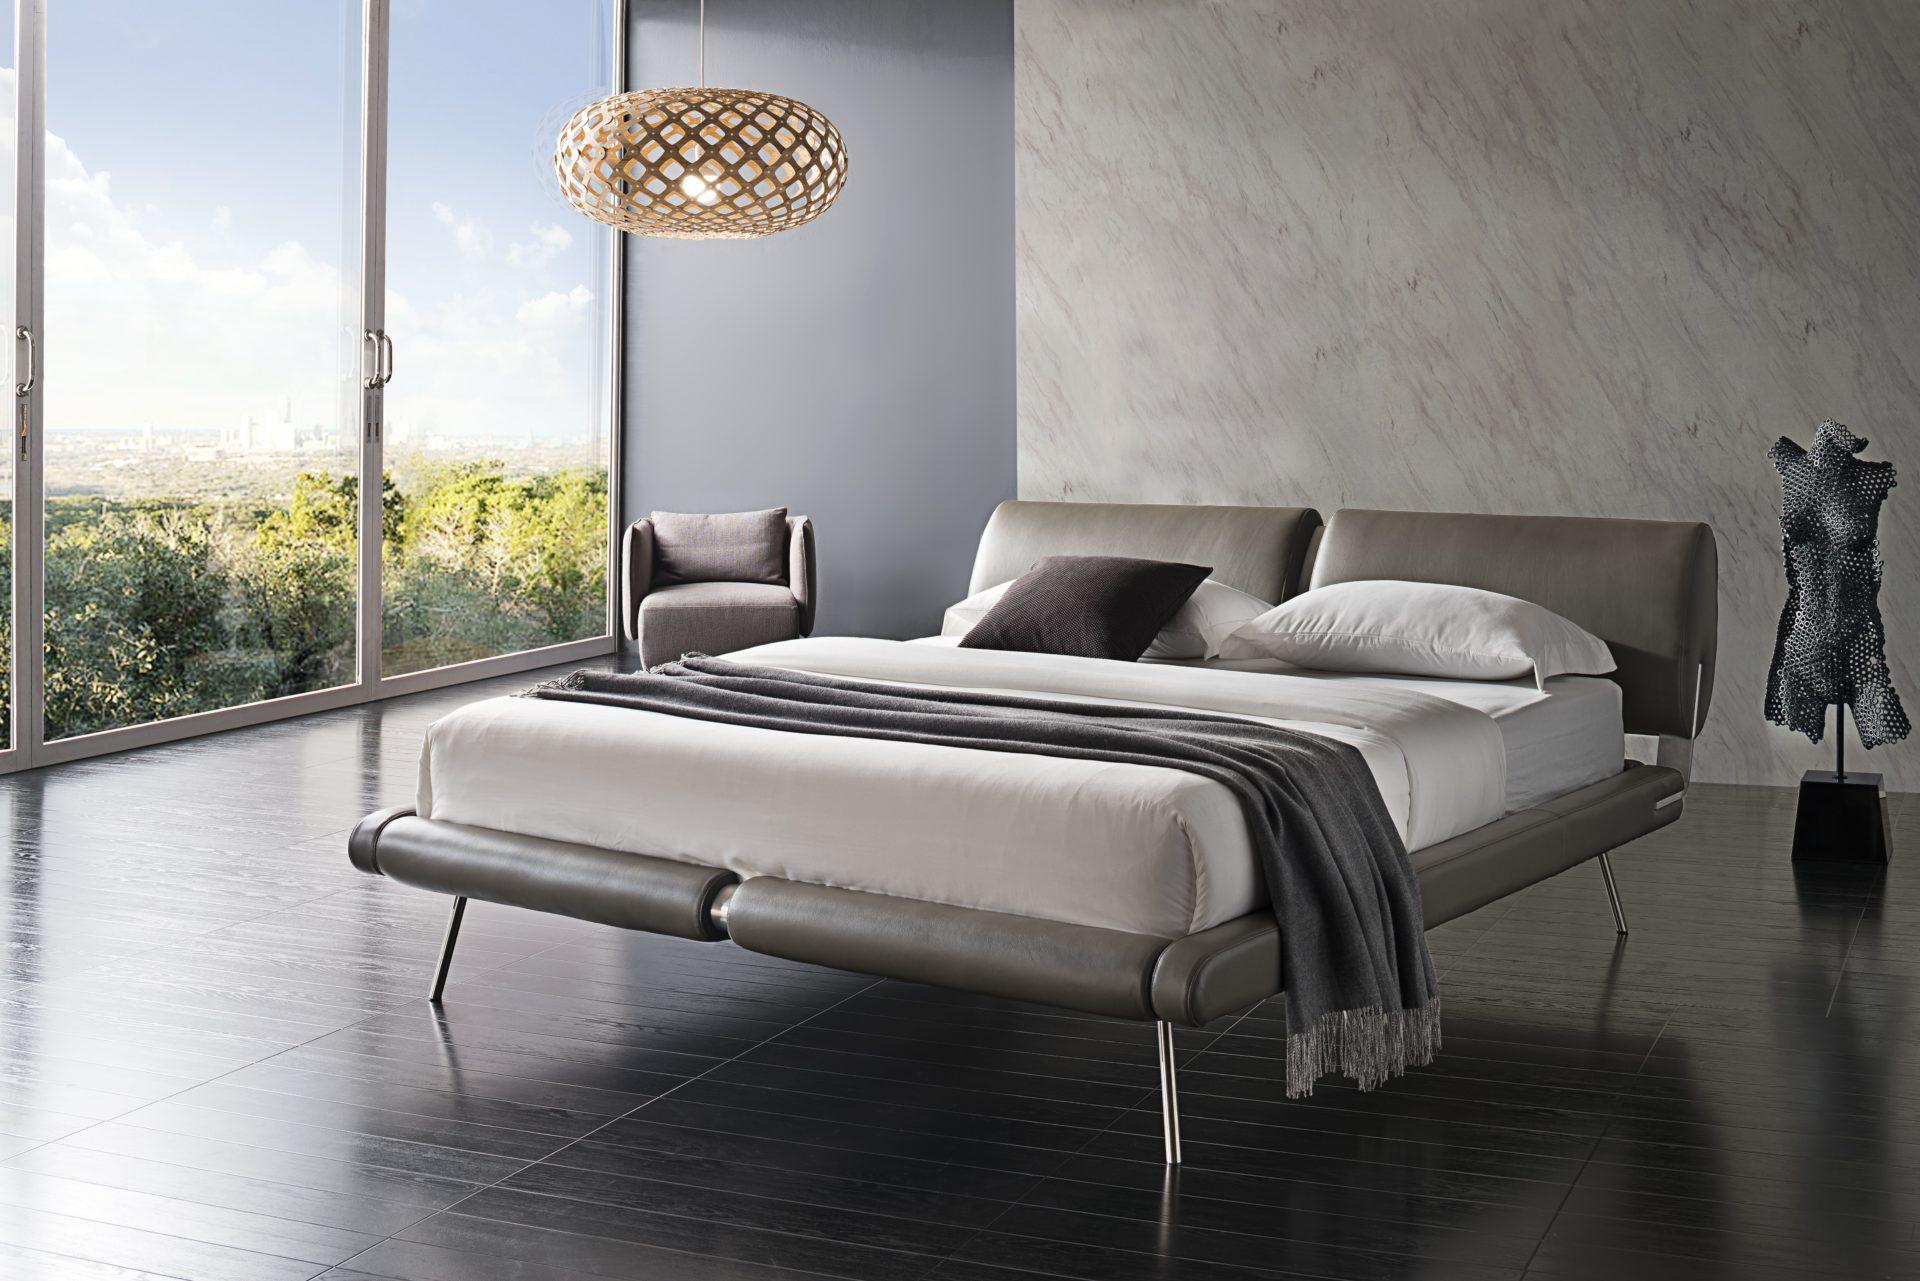 Zonda Bed